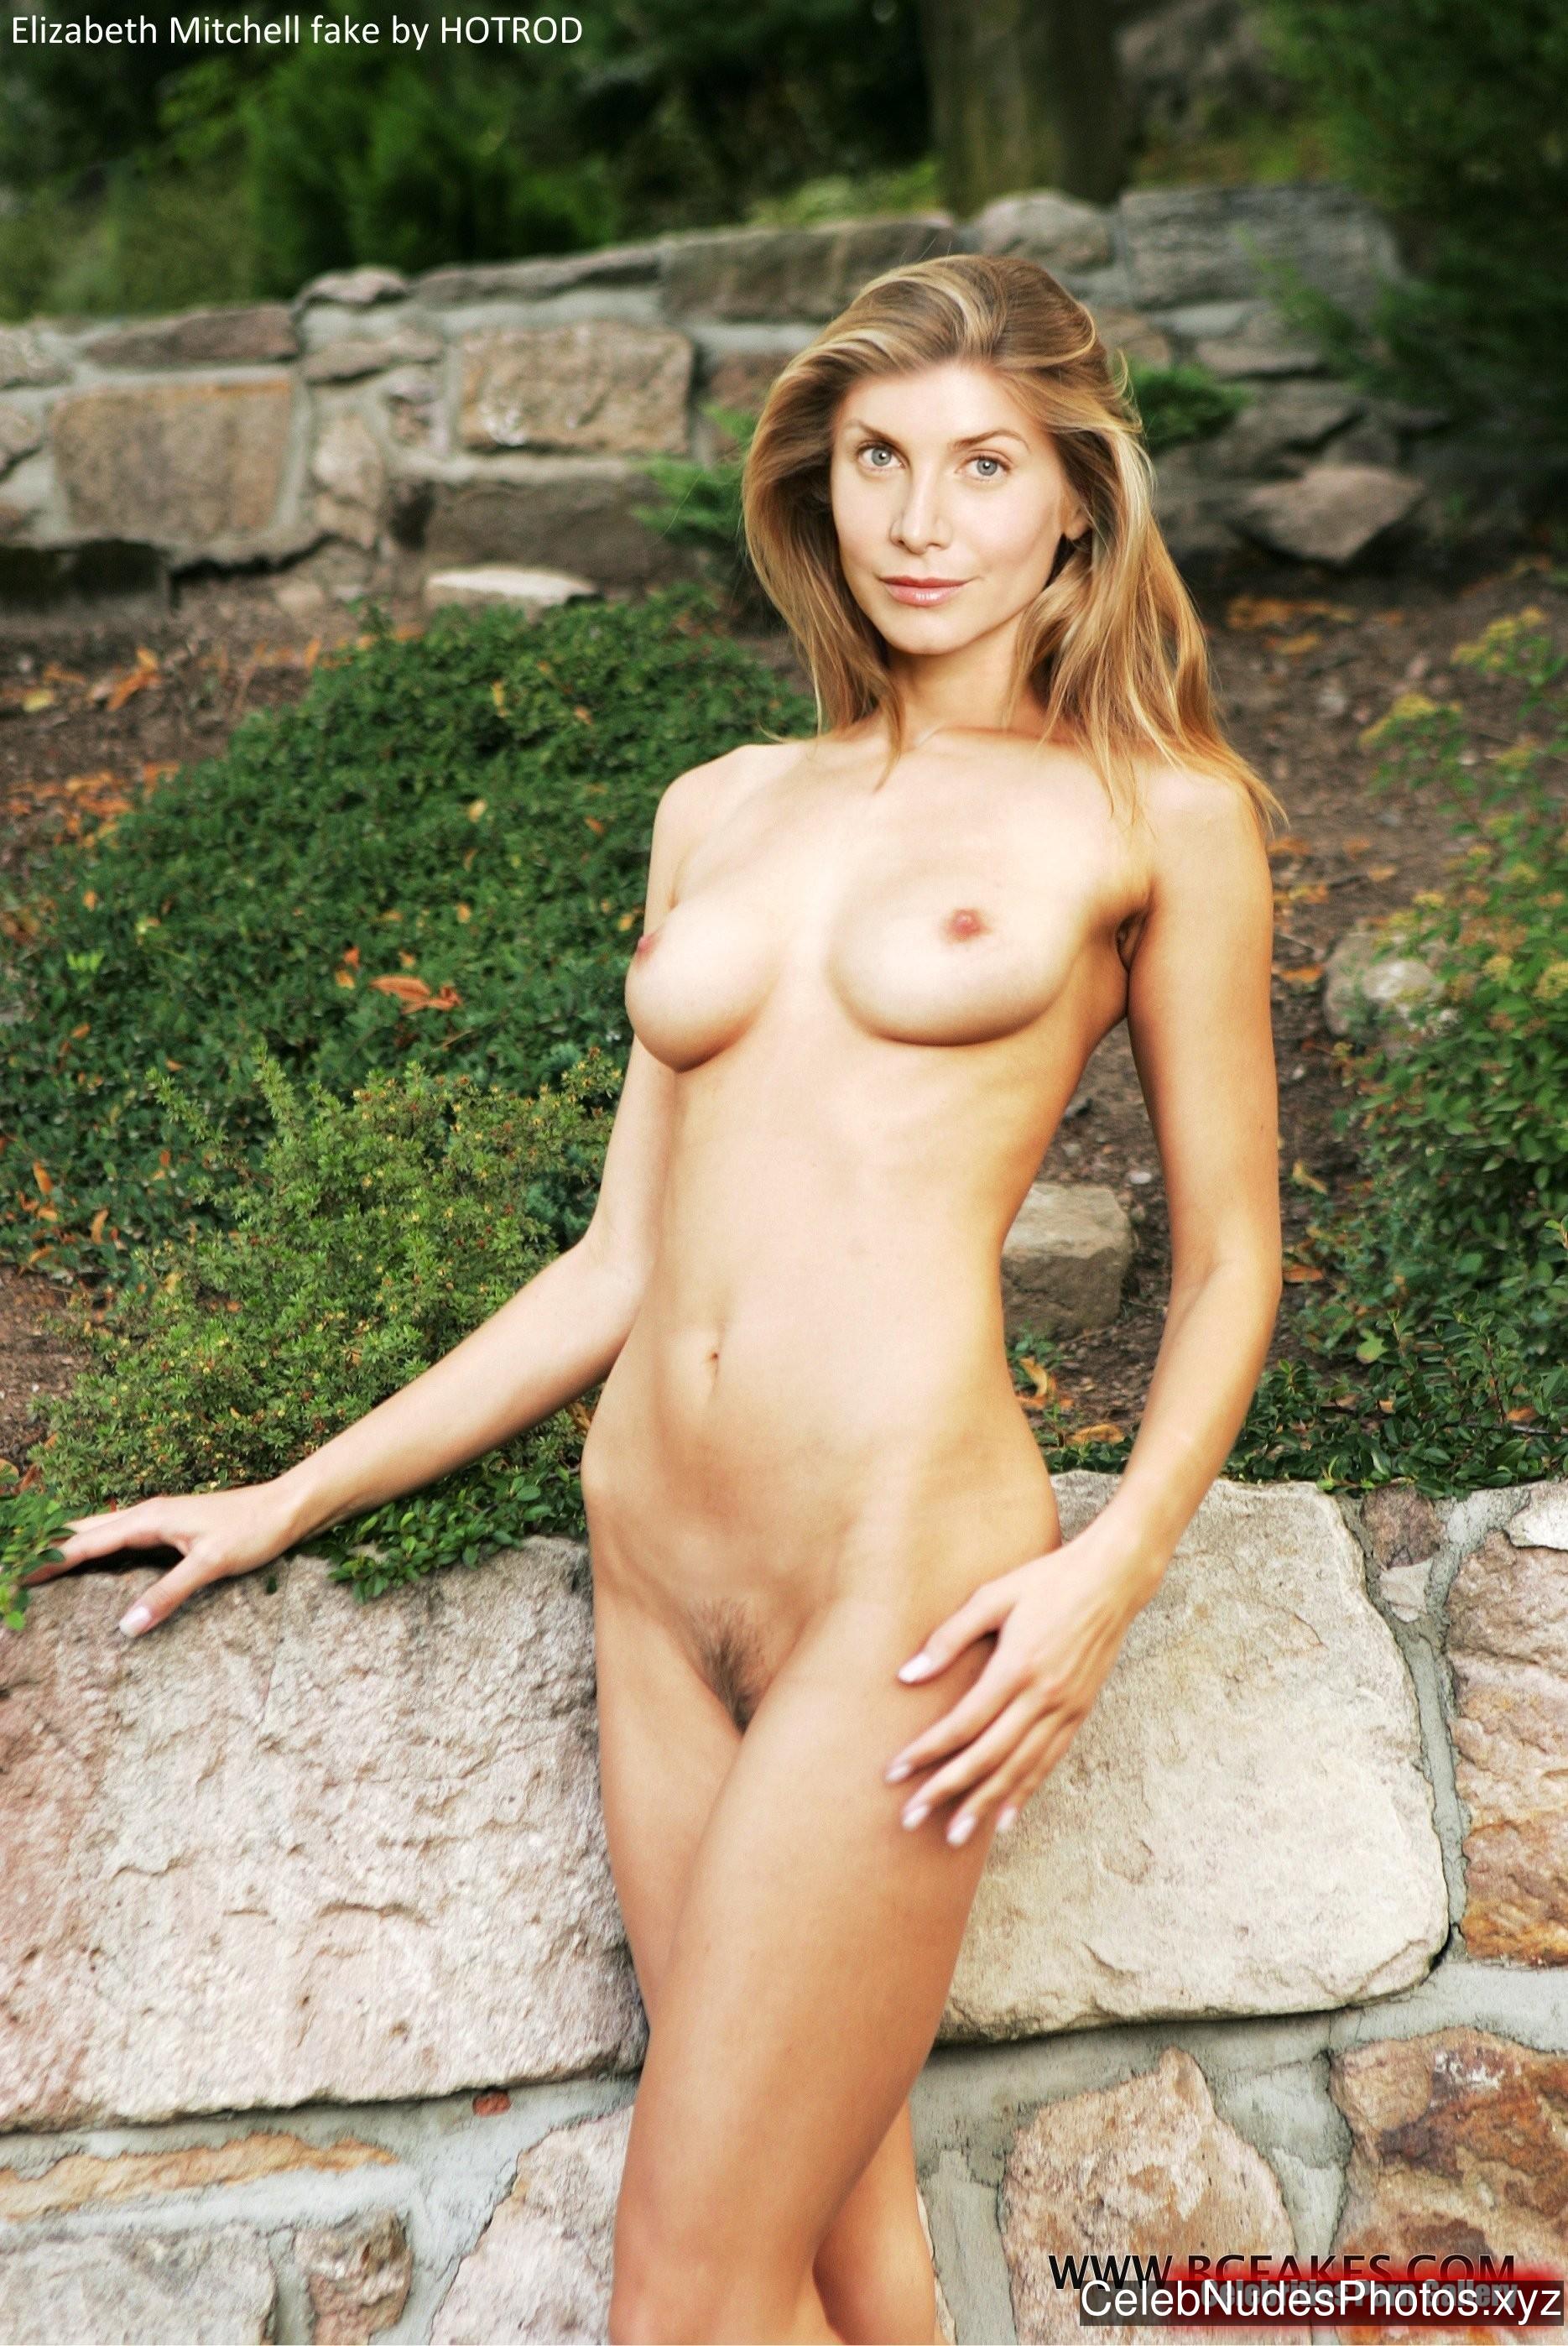 Elizabeth Mitchell Celebrity Nude Pic sexy 14